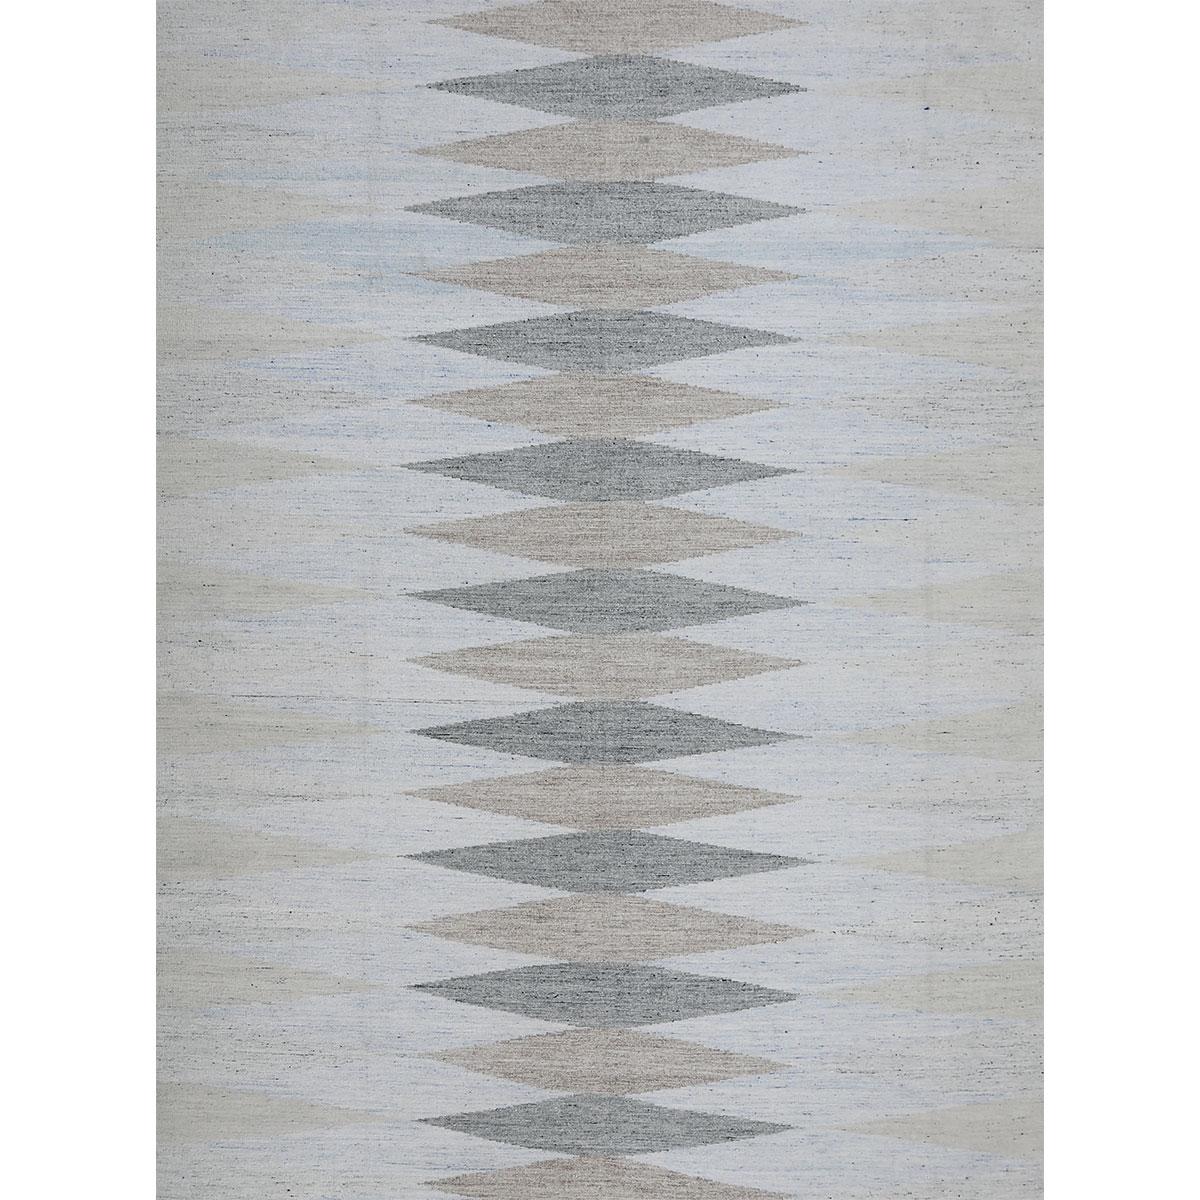 avesta_wool-faux-silk_hand-woven_patterson-flynn-martin_pfm